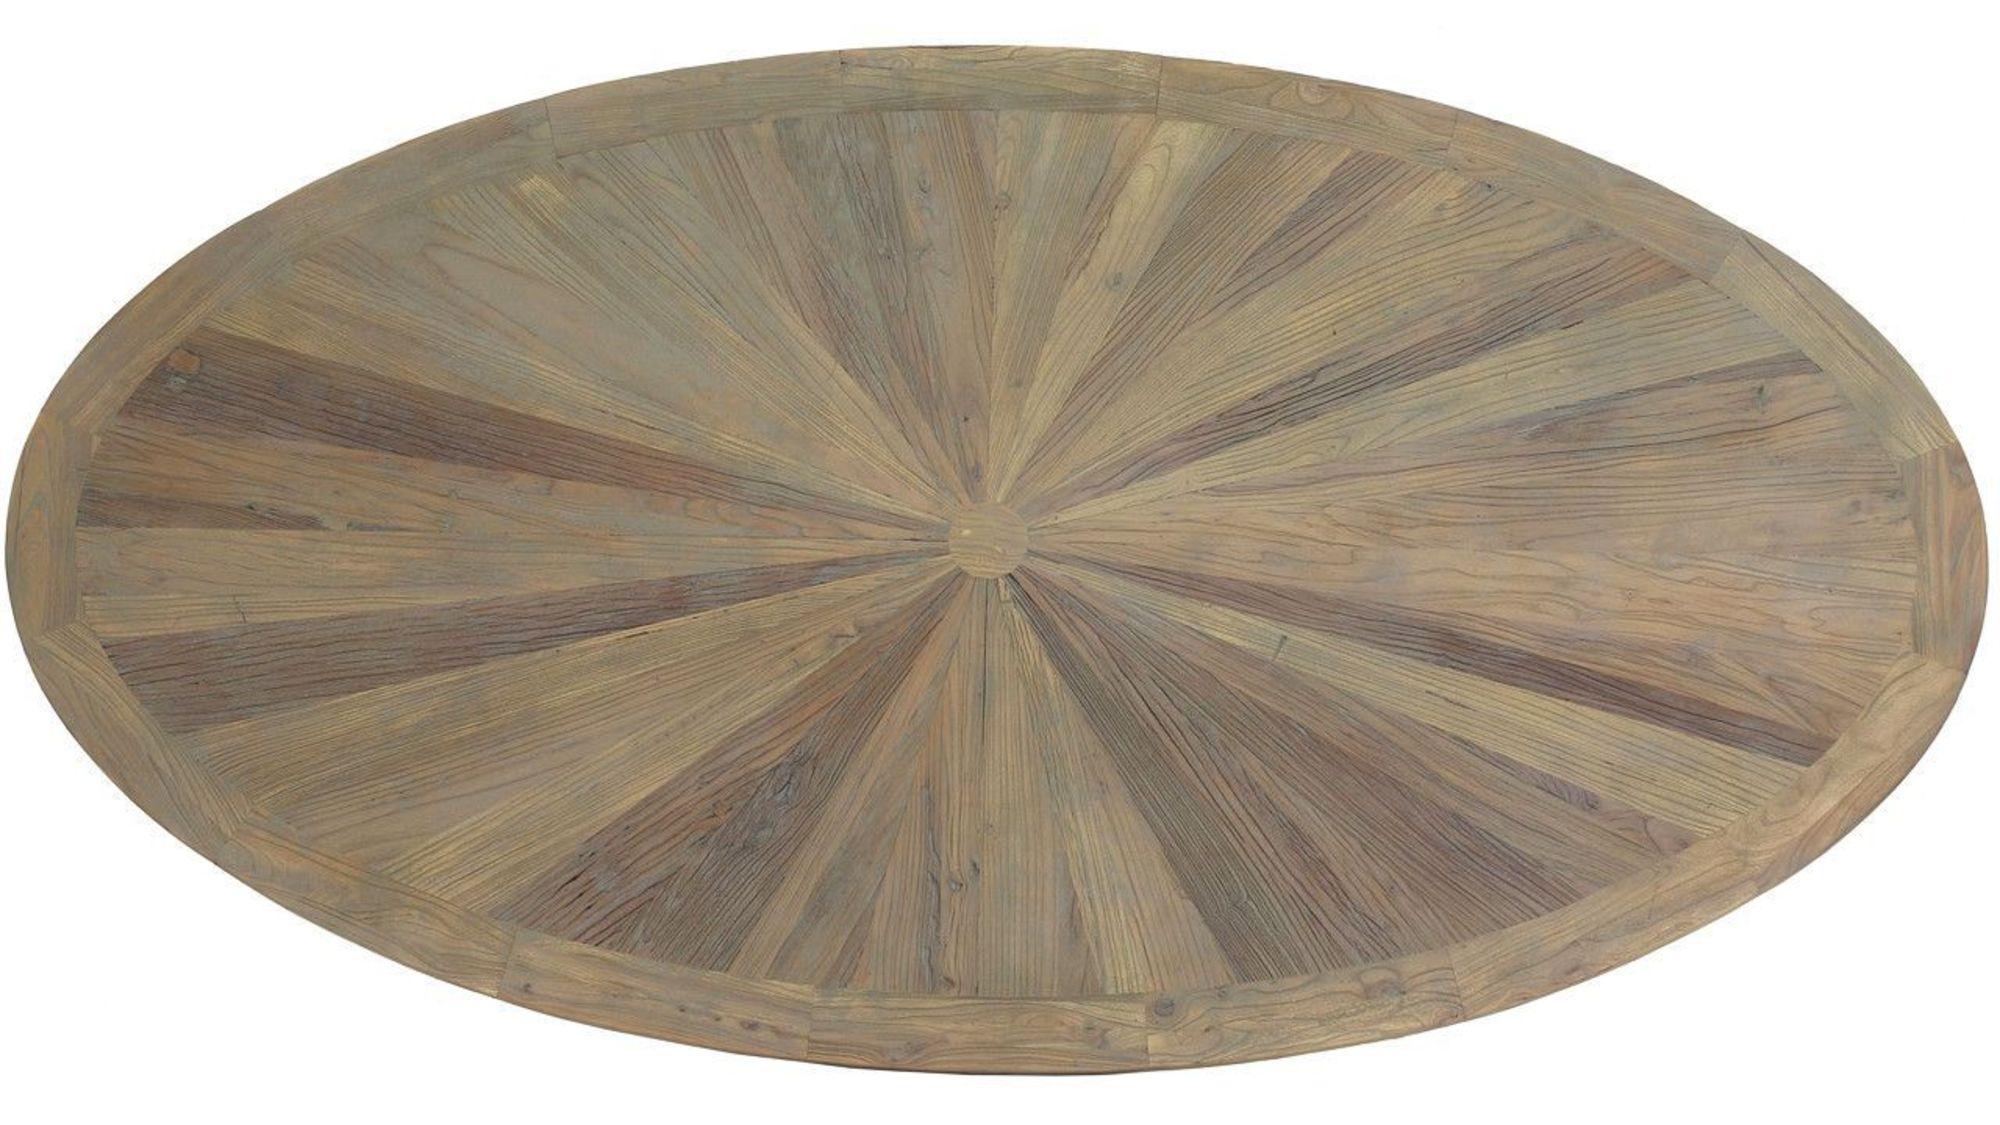 table originale aberdeen ovale bois chene richmond interiors boisetdeco nord. Black Bedroom Furniture Sets. Home Design Ideas